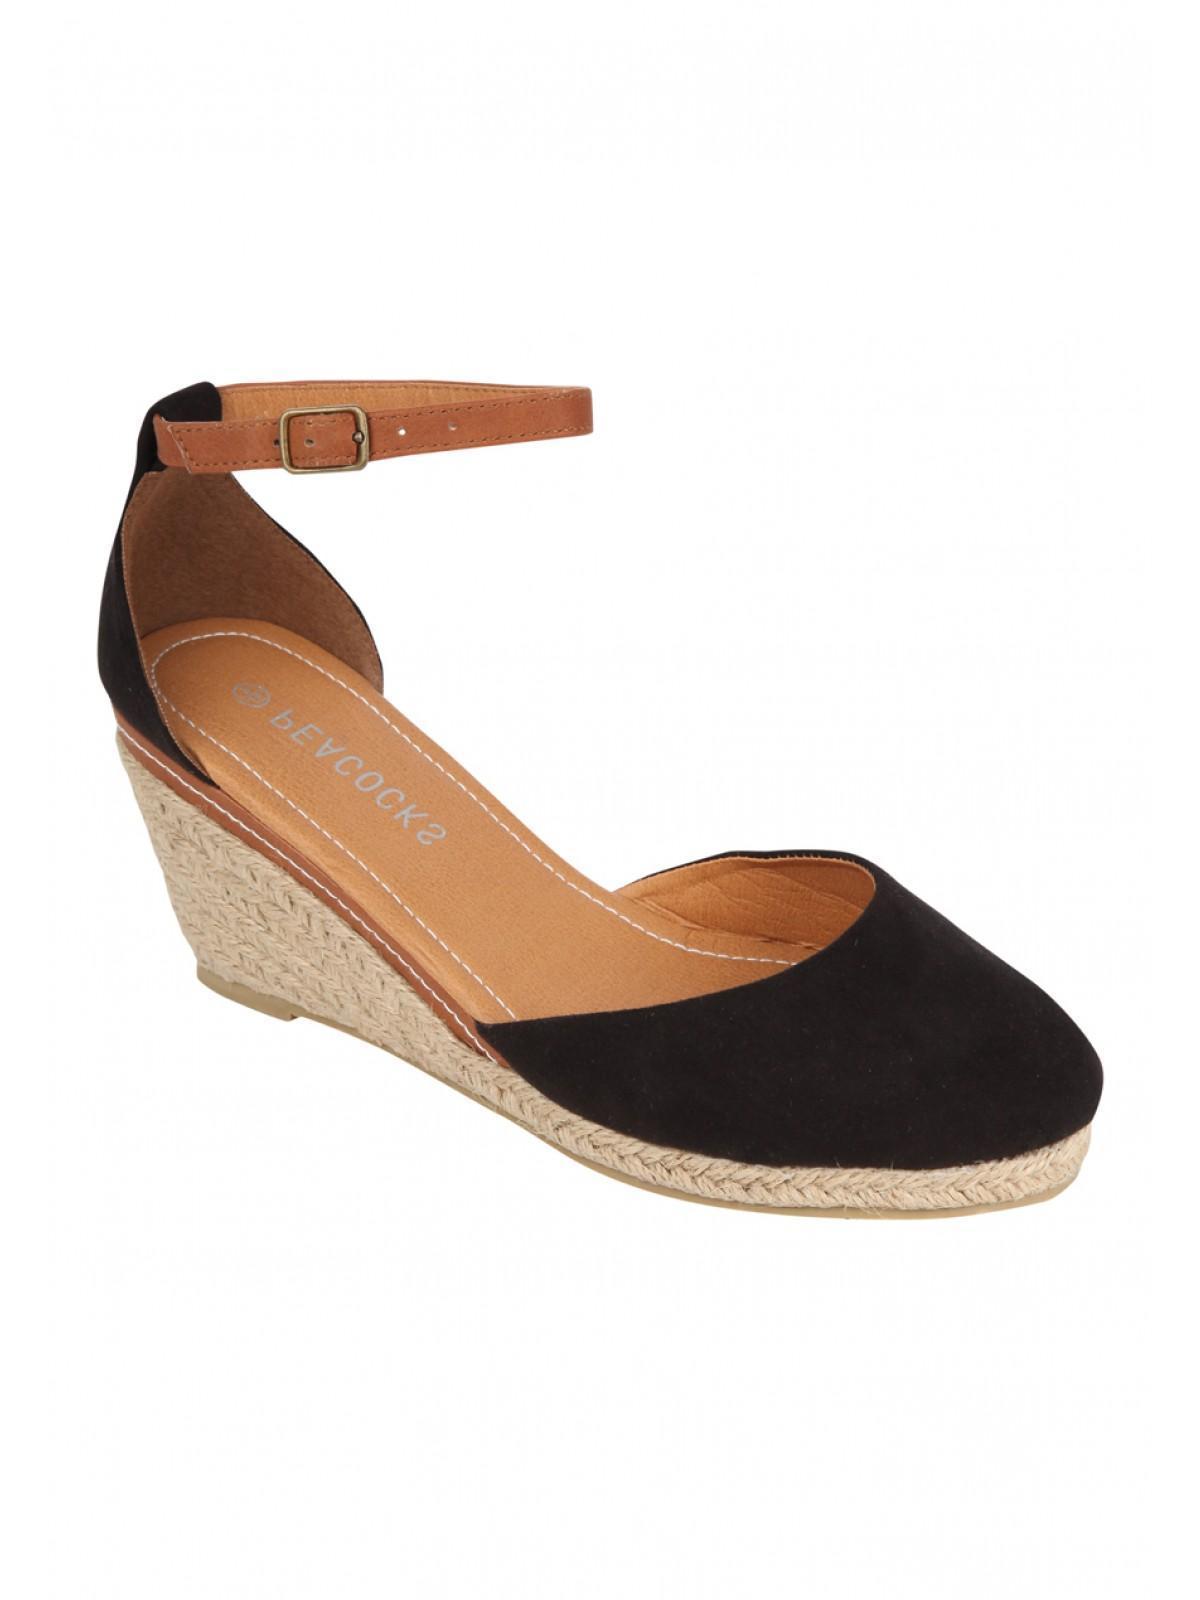 Black enclosed sandals - Black Enclosed Sandals 17